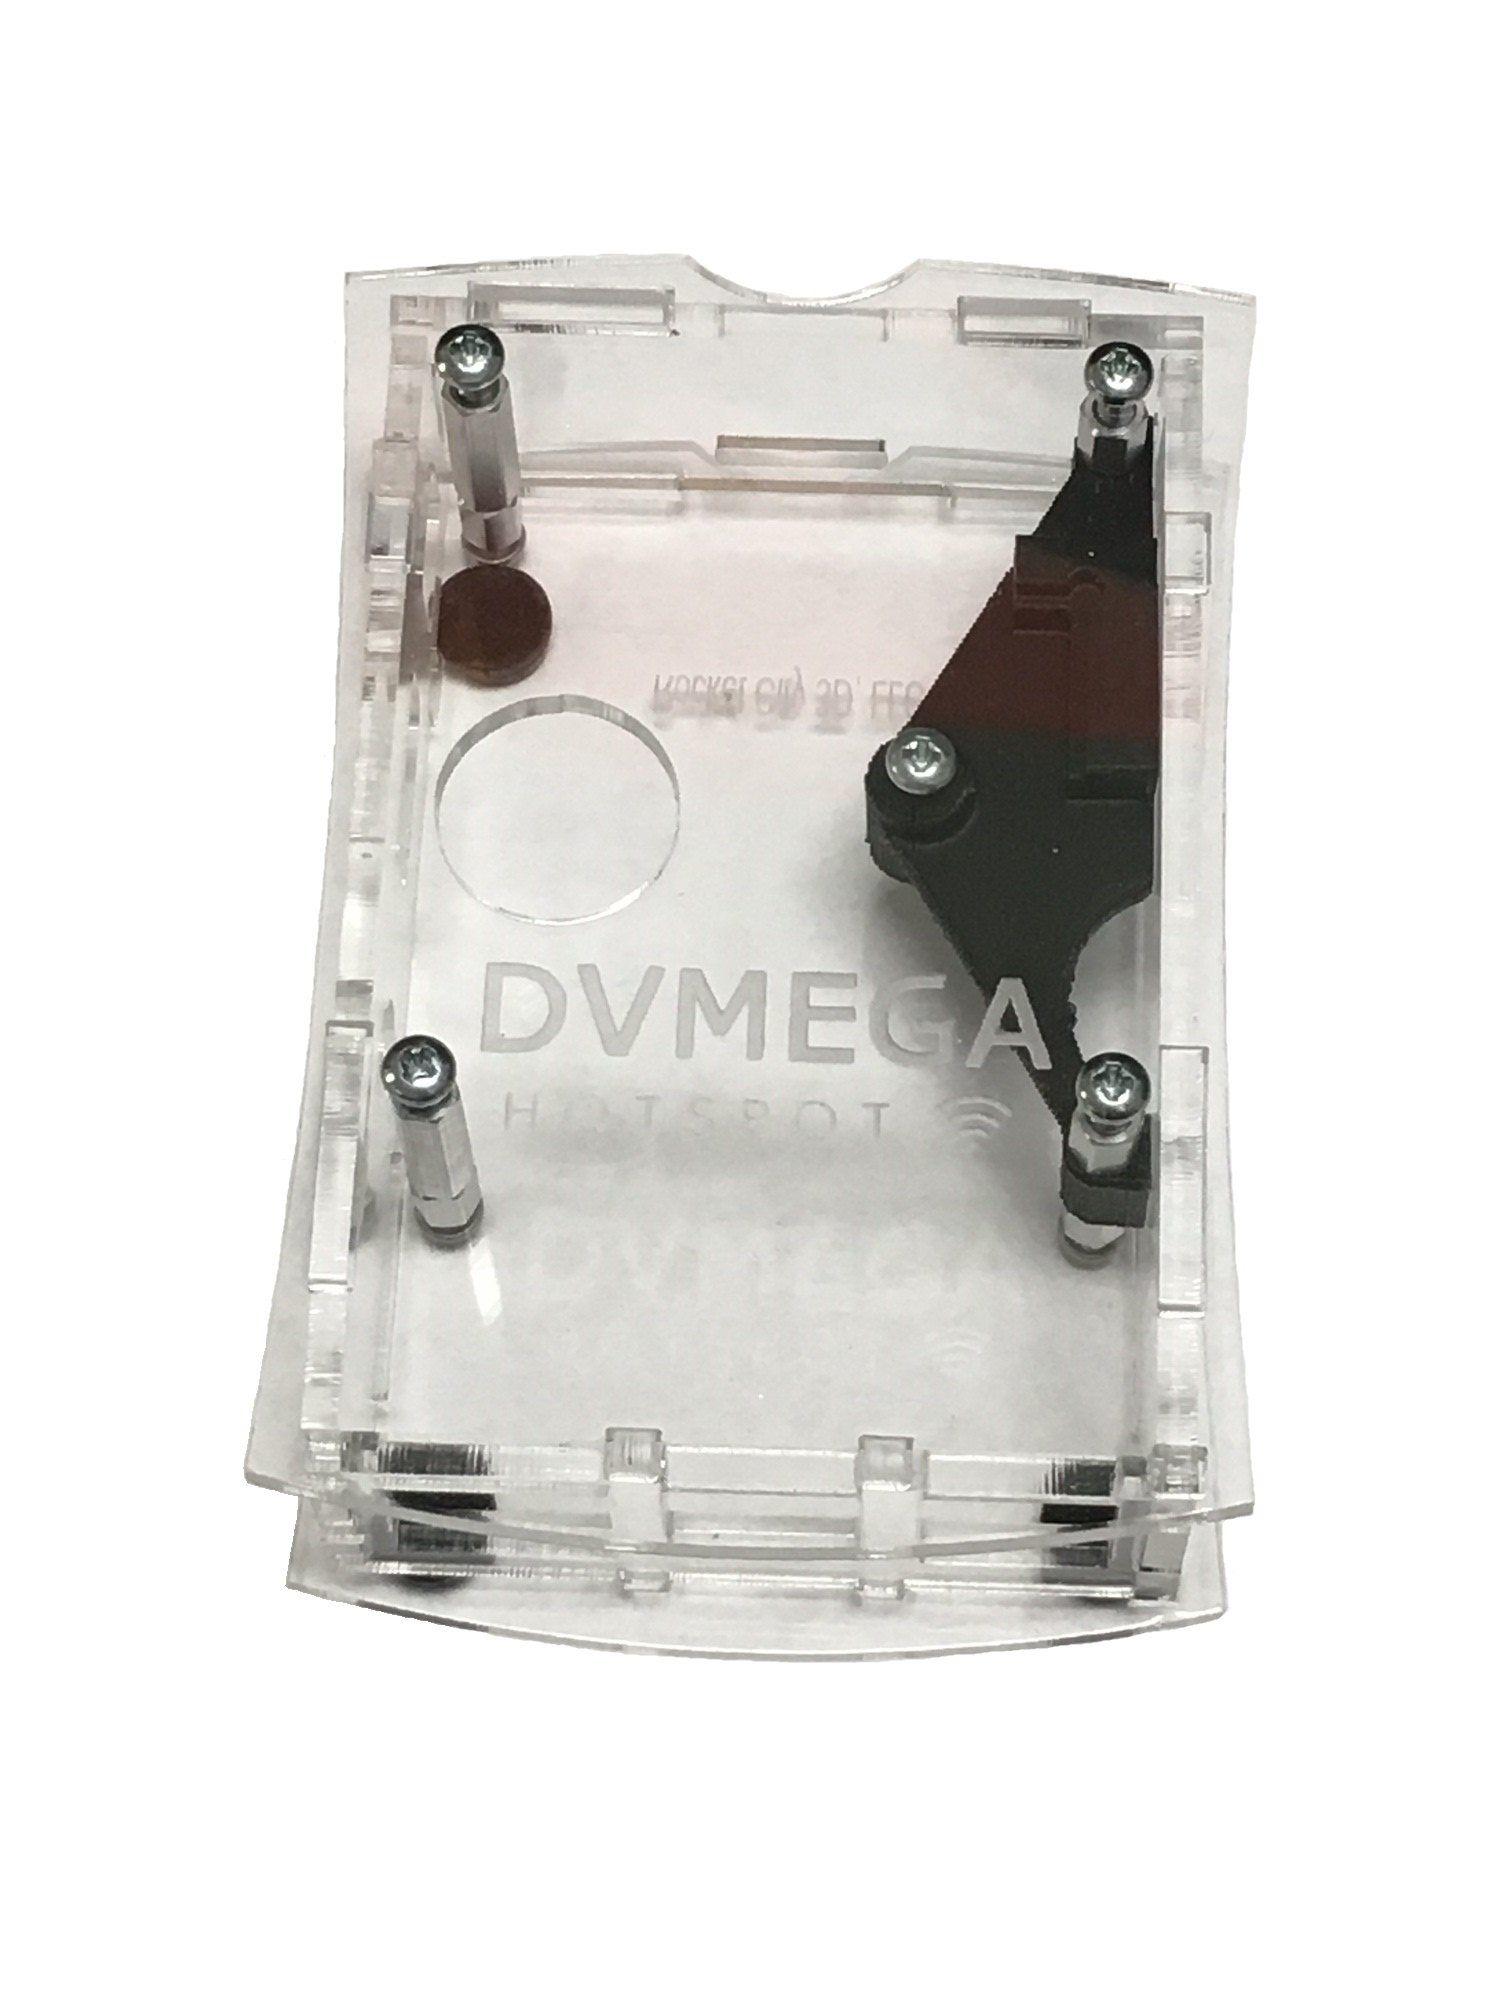 DSTAR radio for Raspberry Pi with DVMEGA Case Bundle! VHF//UHF DVMEGA Dual band